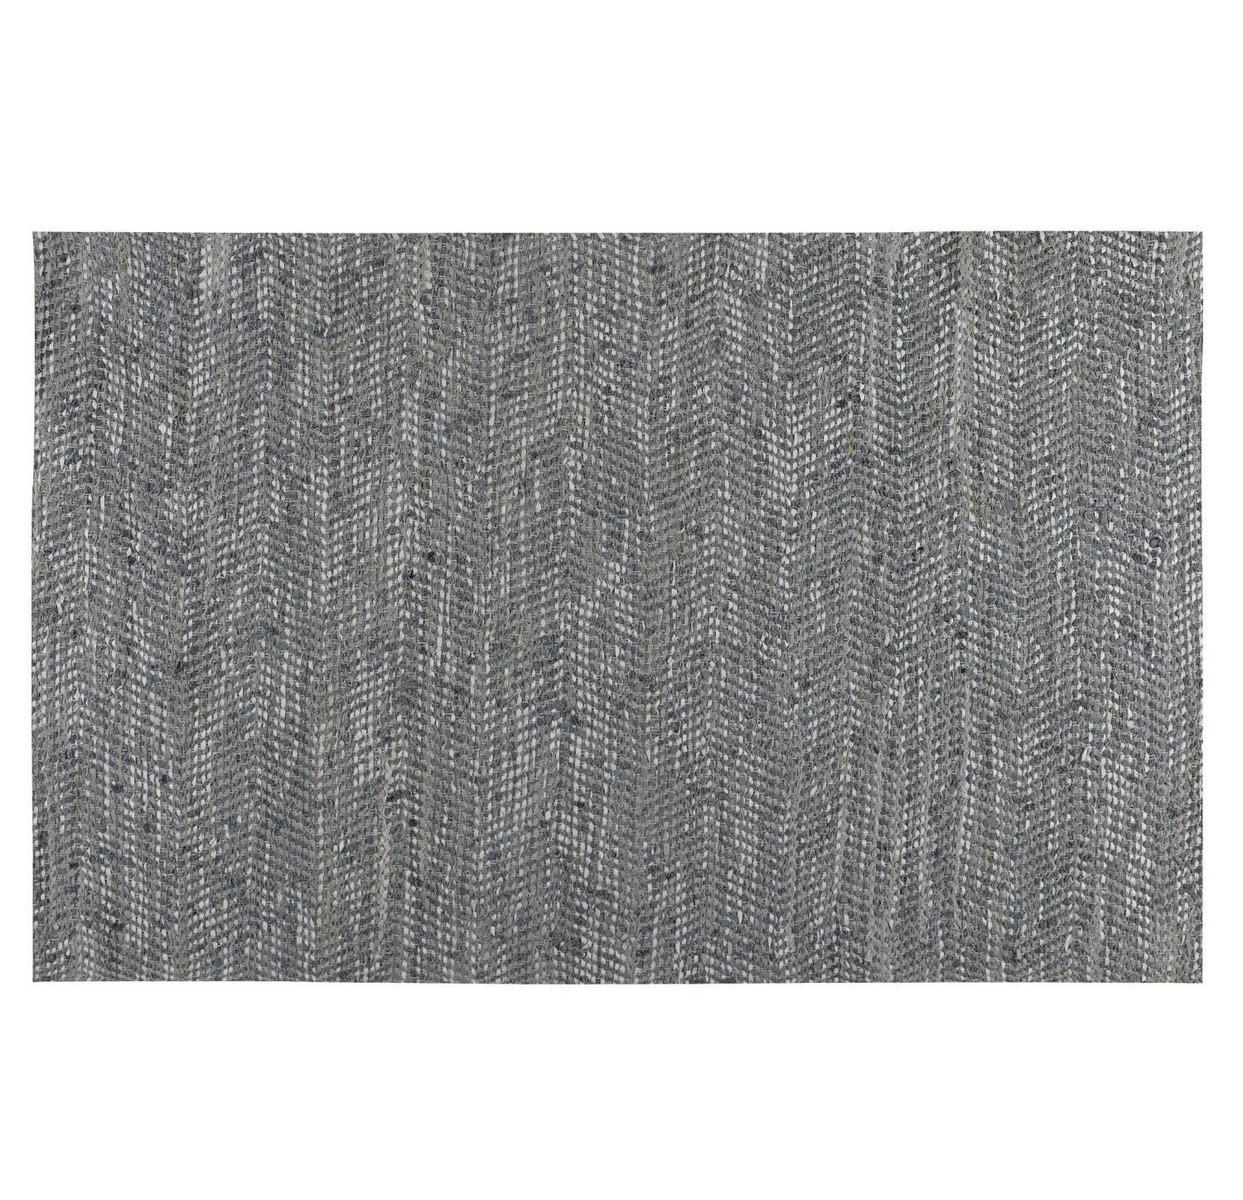 Uttermost Branson 9 X 12 Woven Rug - Gray Blue